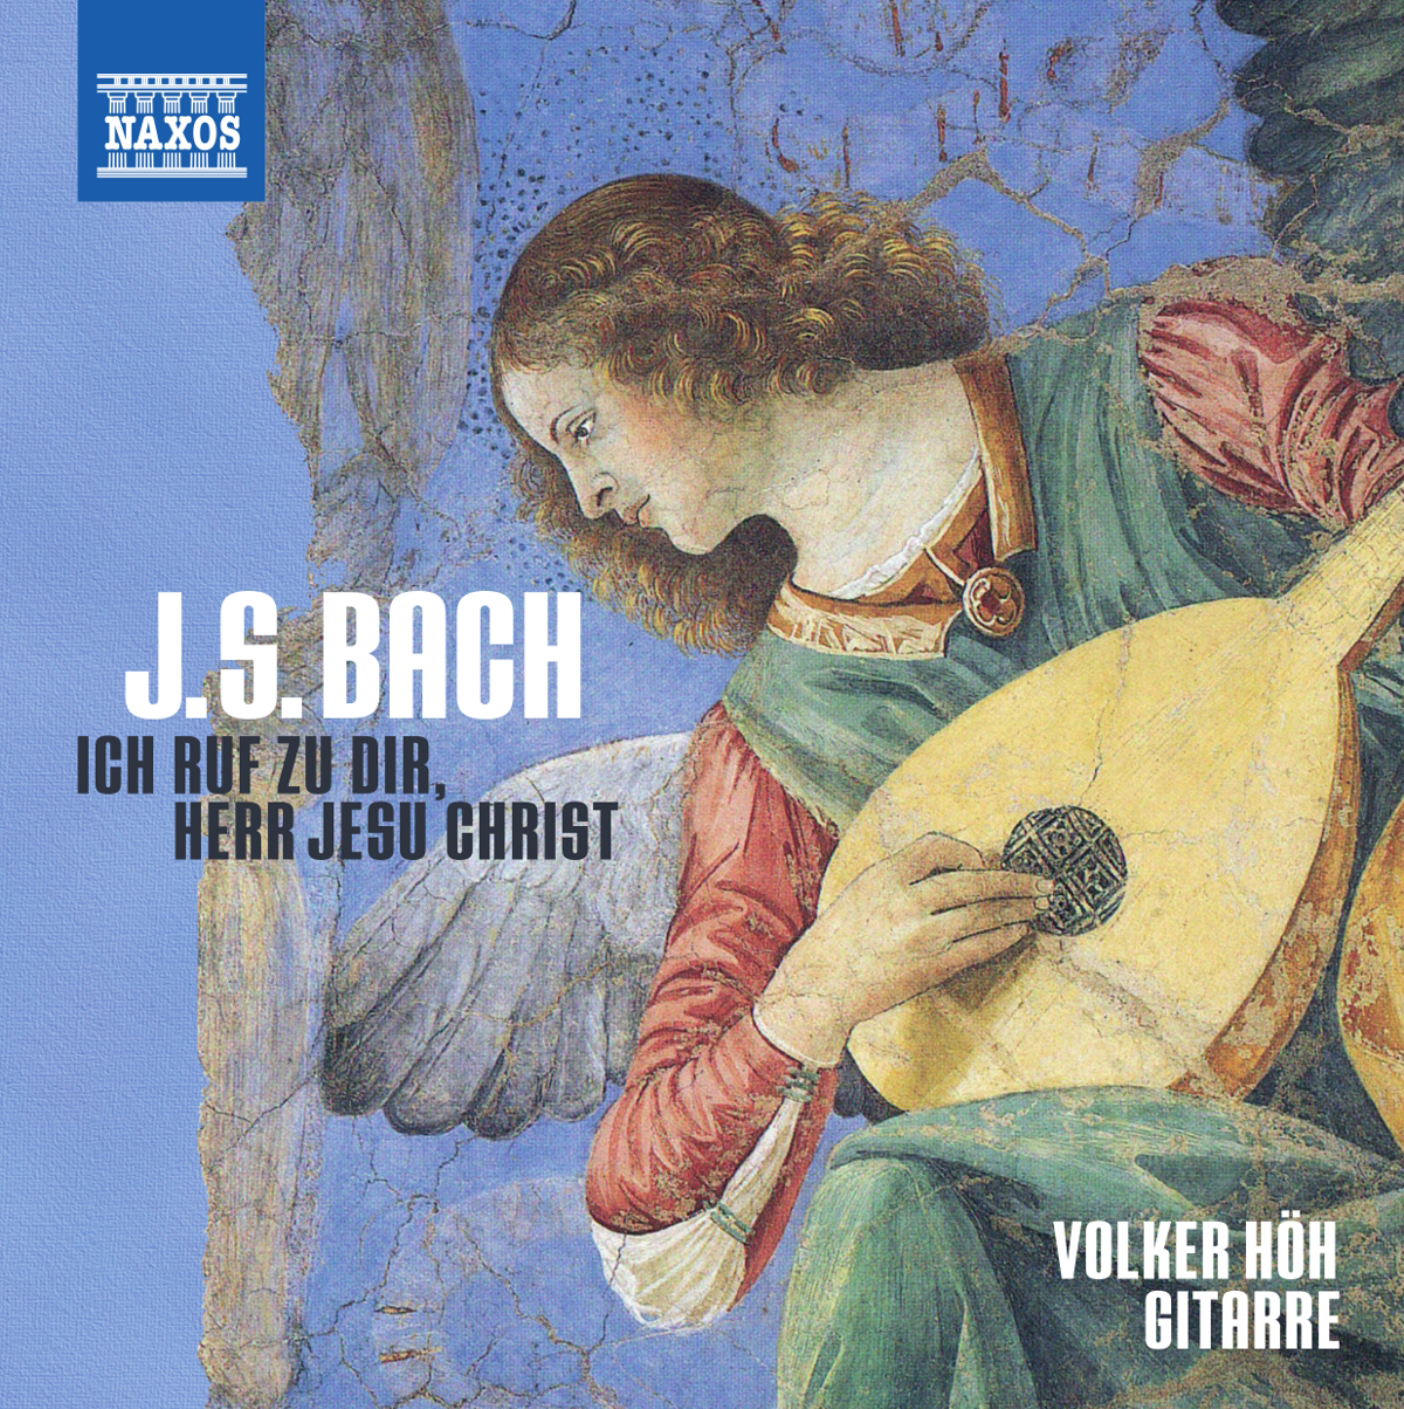 J.S. Bach: Ich ruf zu dir, Herr Jesu Christ